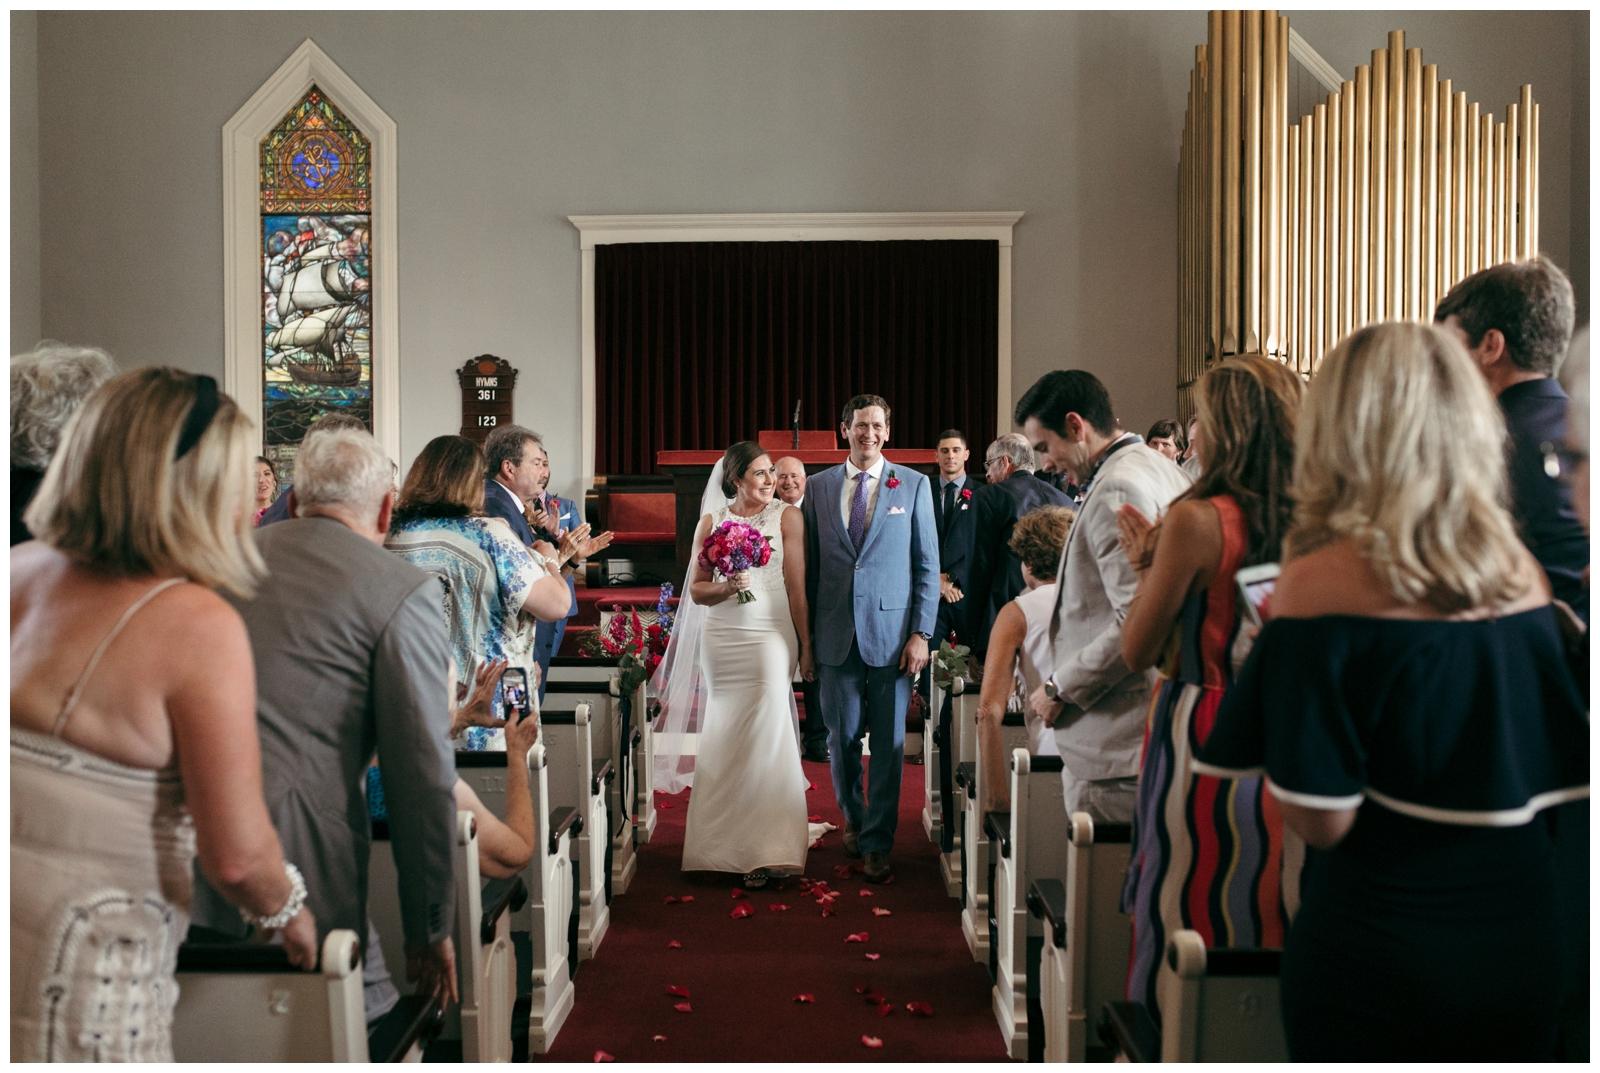 Bailey-Q-Photo-Backyard-Wedding-South-Shore-Boston-Wedding-Photographer-054.jpg